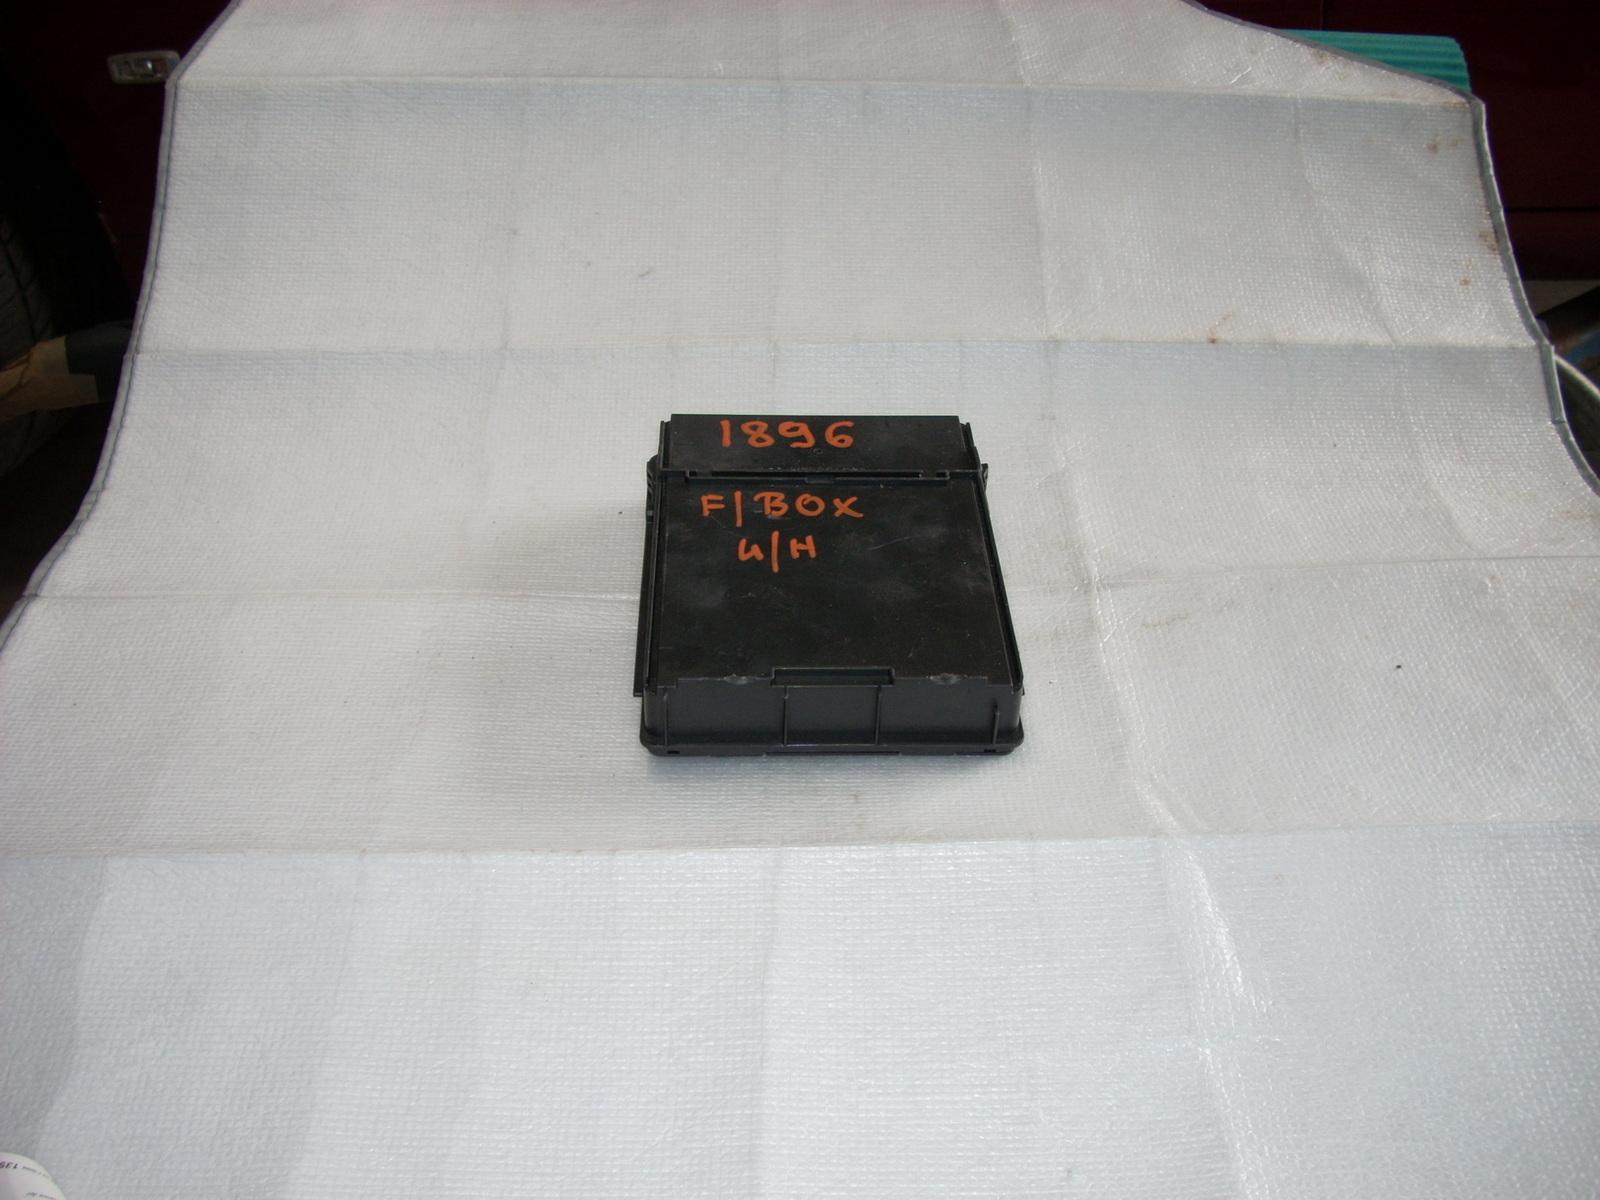 2012 Nissan Versa Fuse Box Location : Nissan versa fuse box under hood wiring diagram